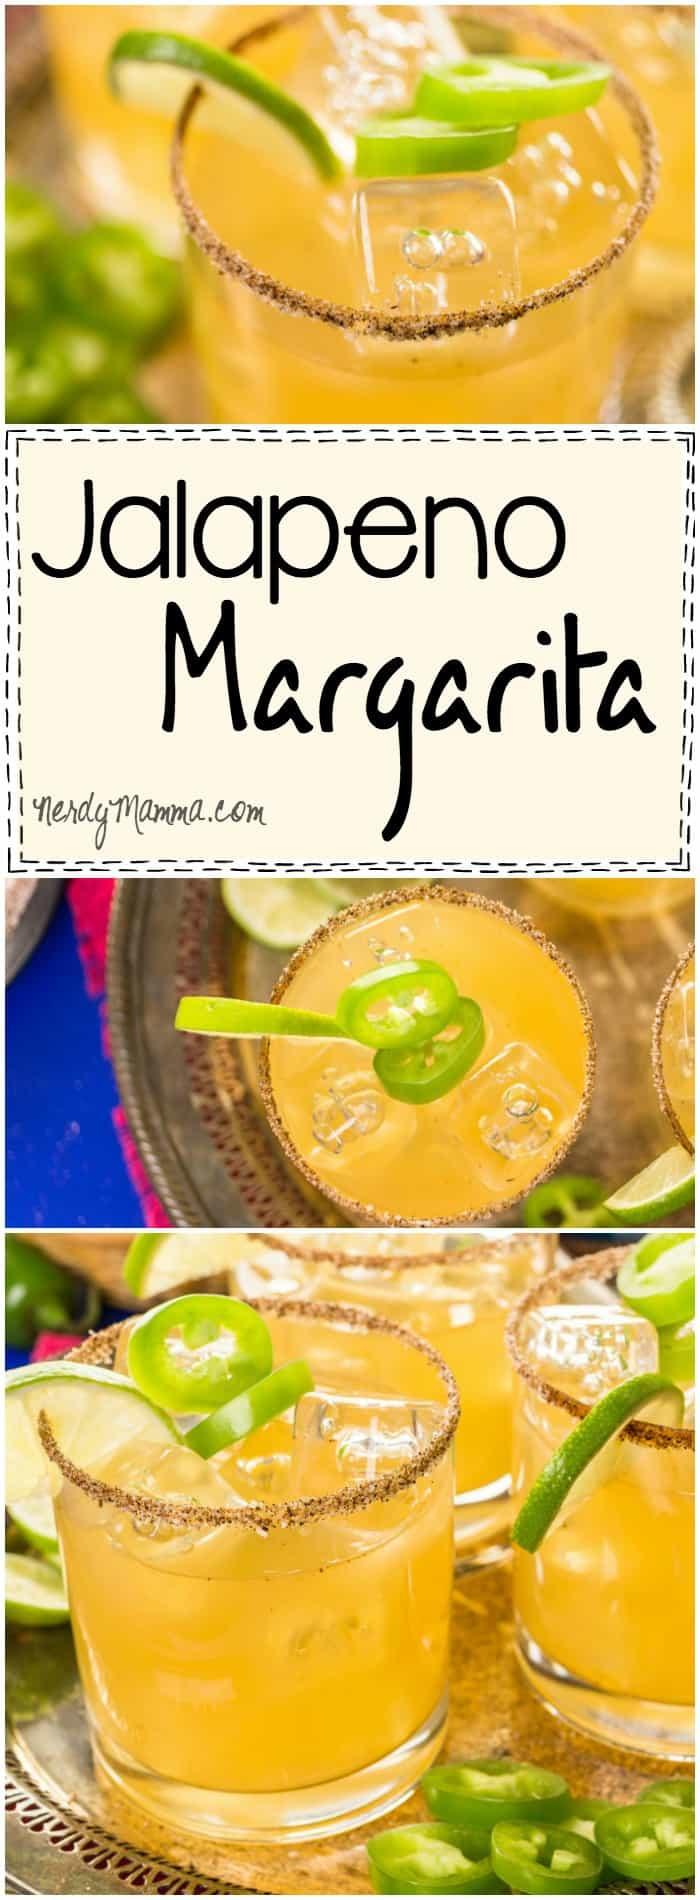 This recipe for a Jalapeno Margarita....woooooow. That sound like it has kick! LOL! I love it.